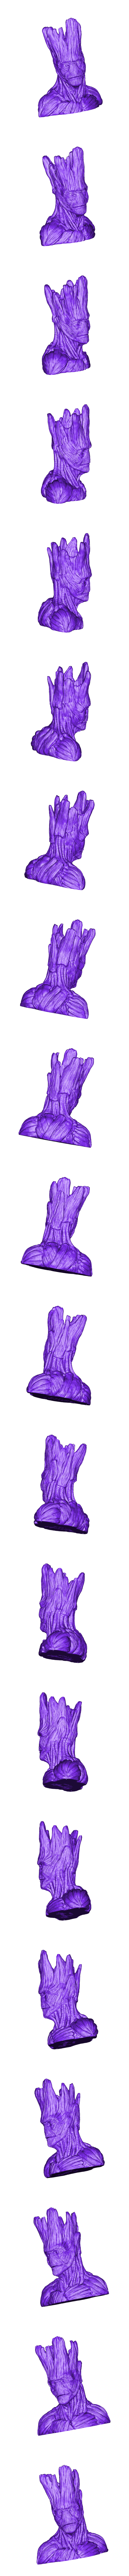 Polysculpt.com_Gout_SLA.stl Download free STL file Grout, Groot's borther • 3D printing template, Polysculpt